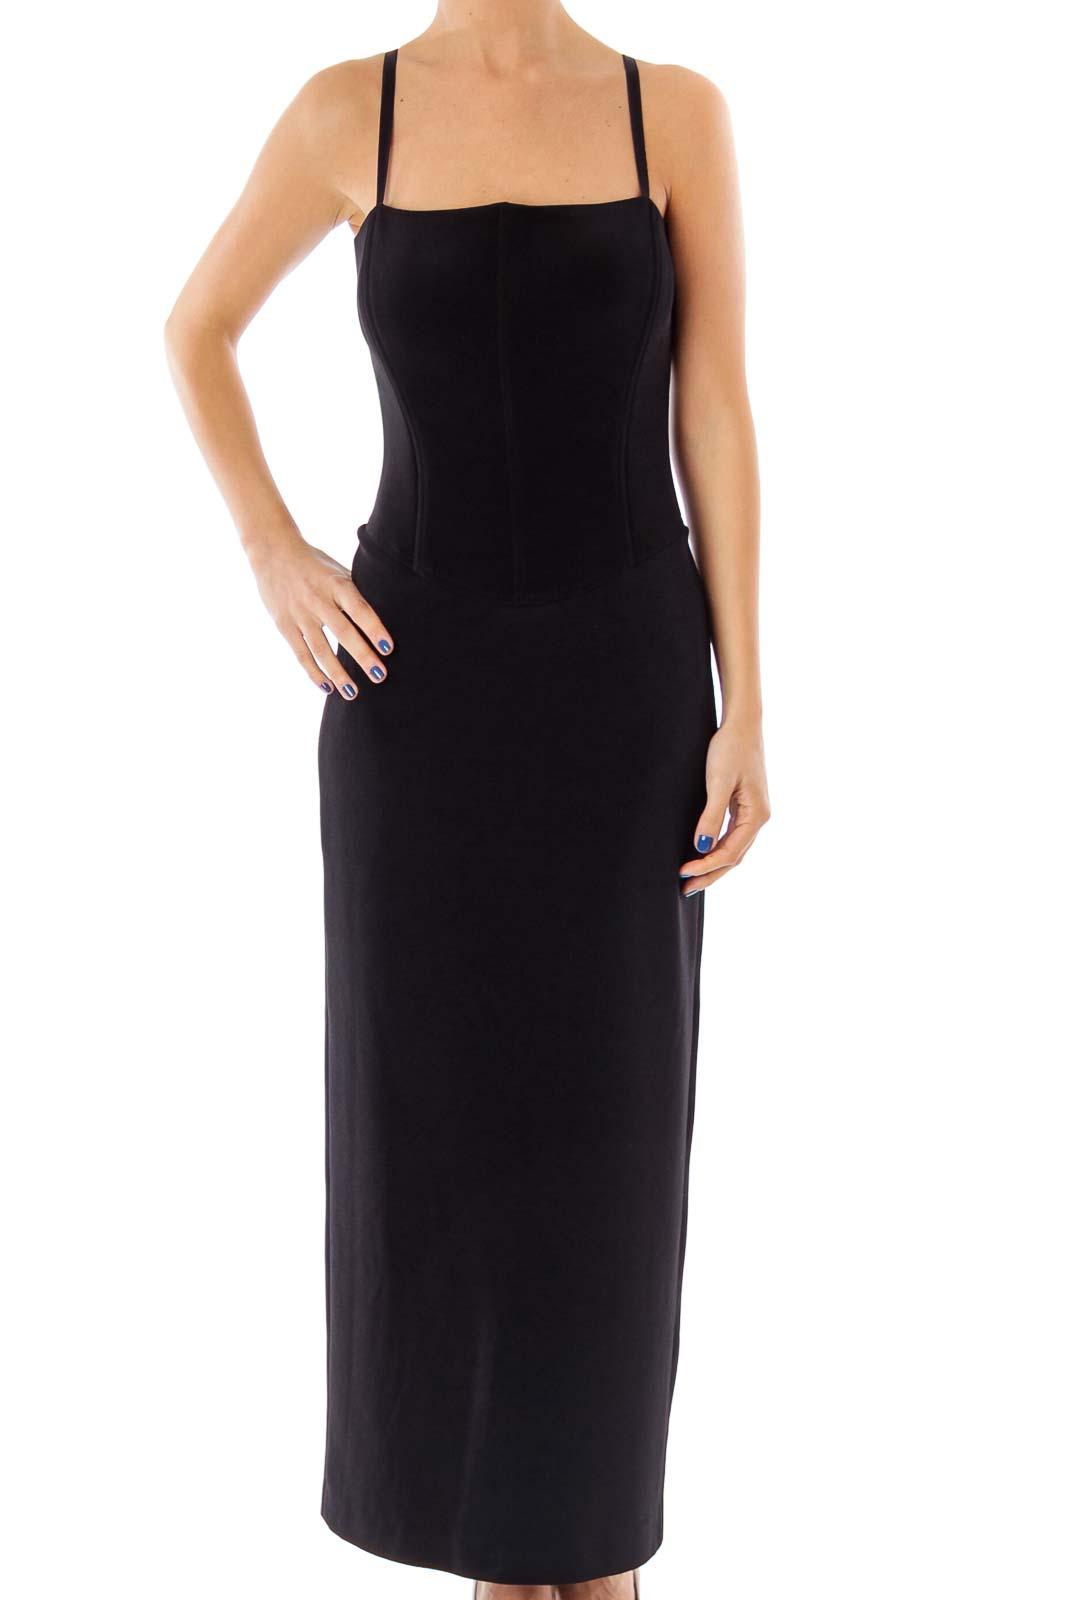 Black Open Back Evening Dress Front